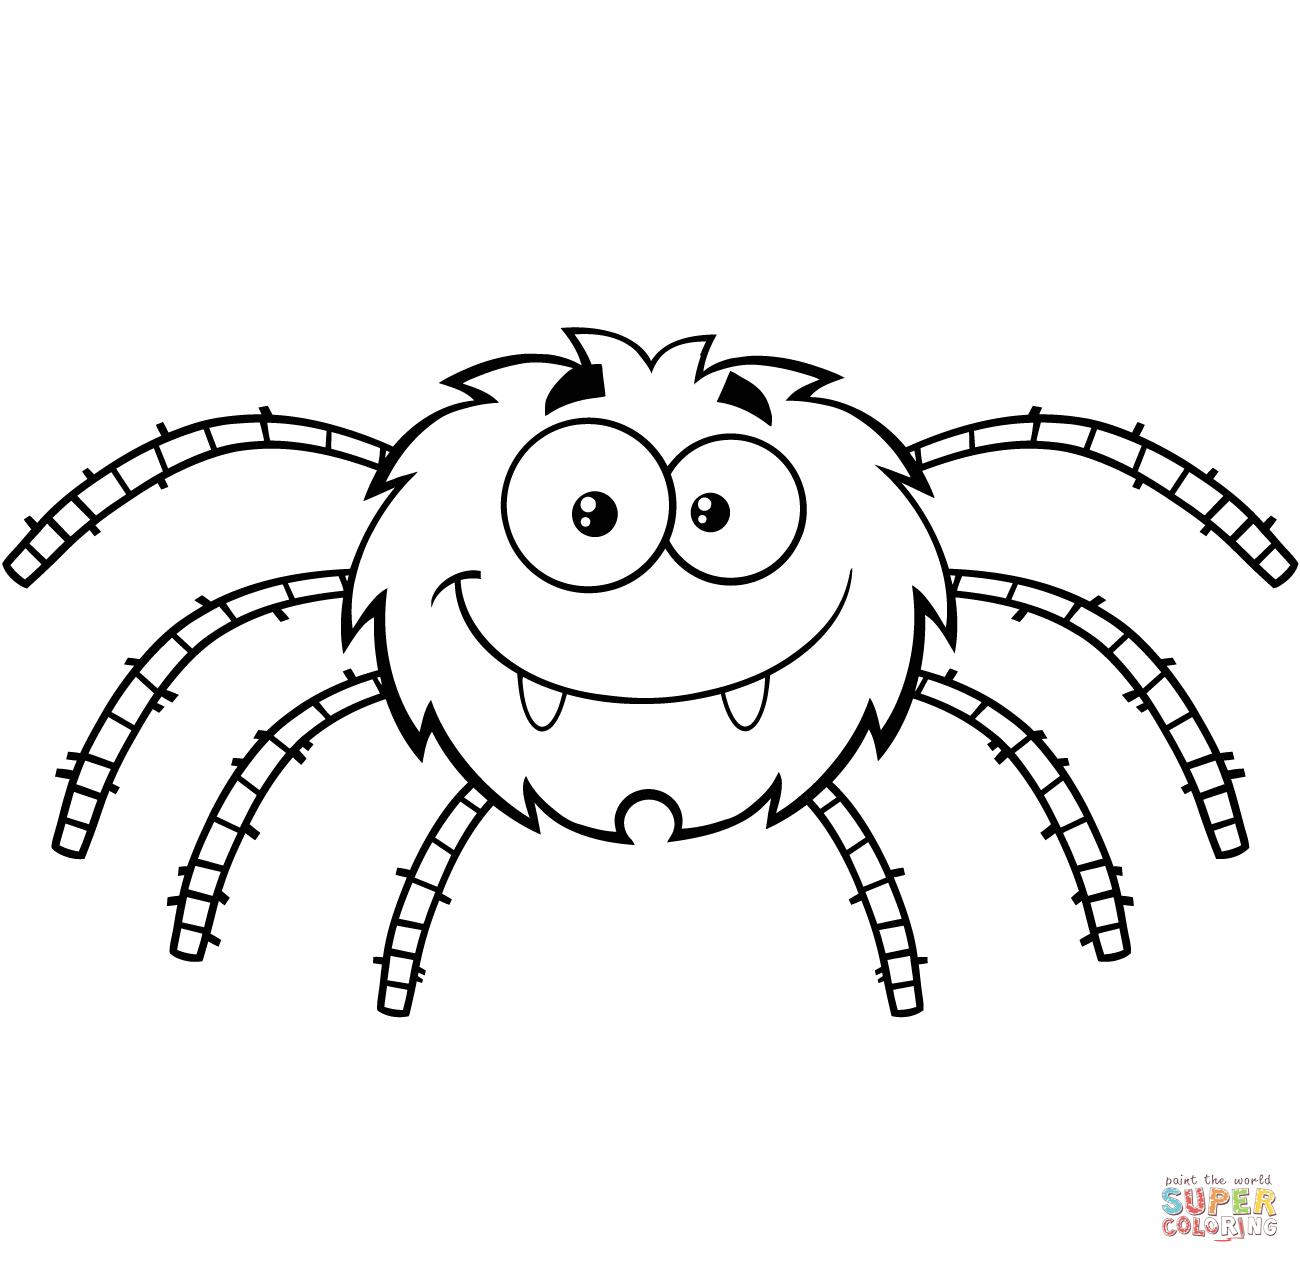 Розмальовки - павуки на Хеллоуїн